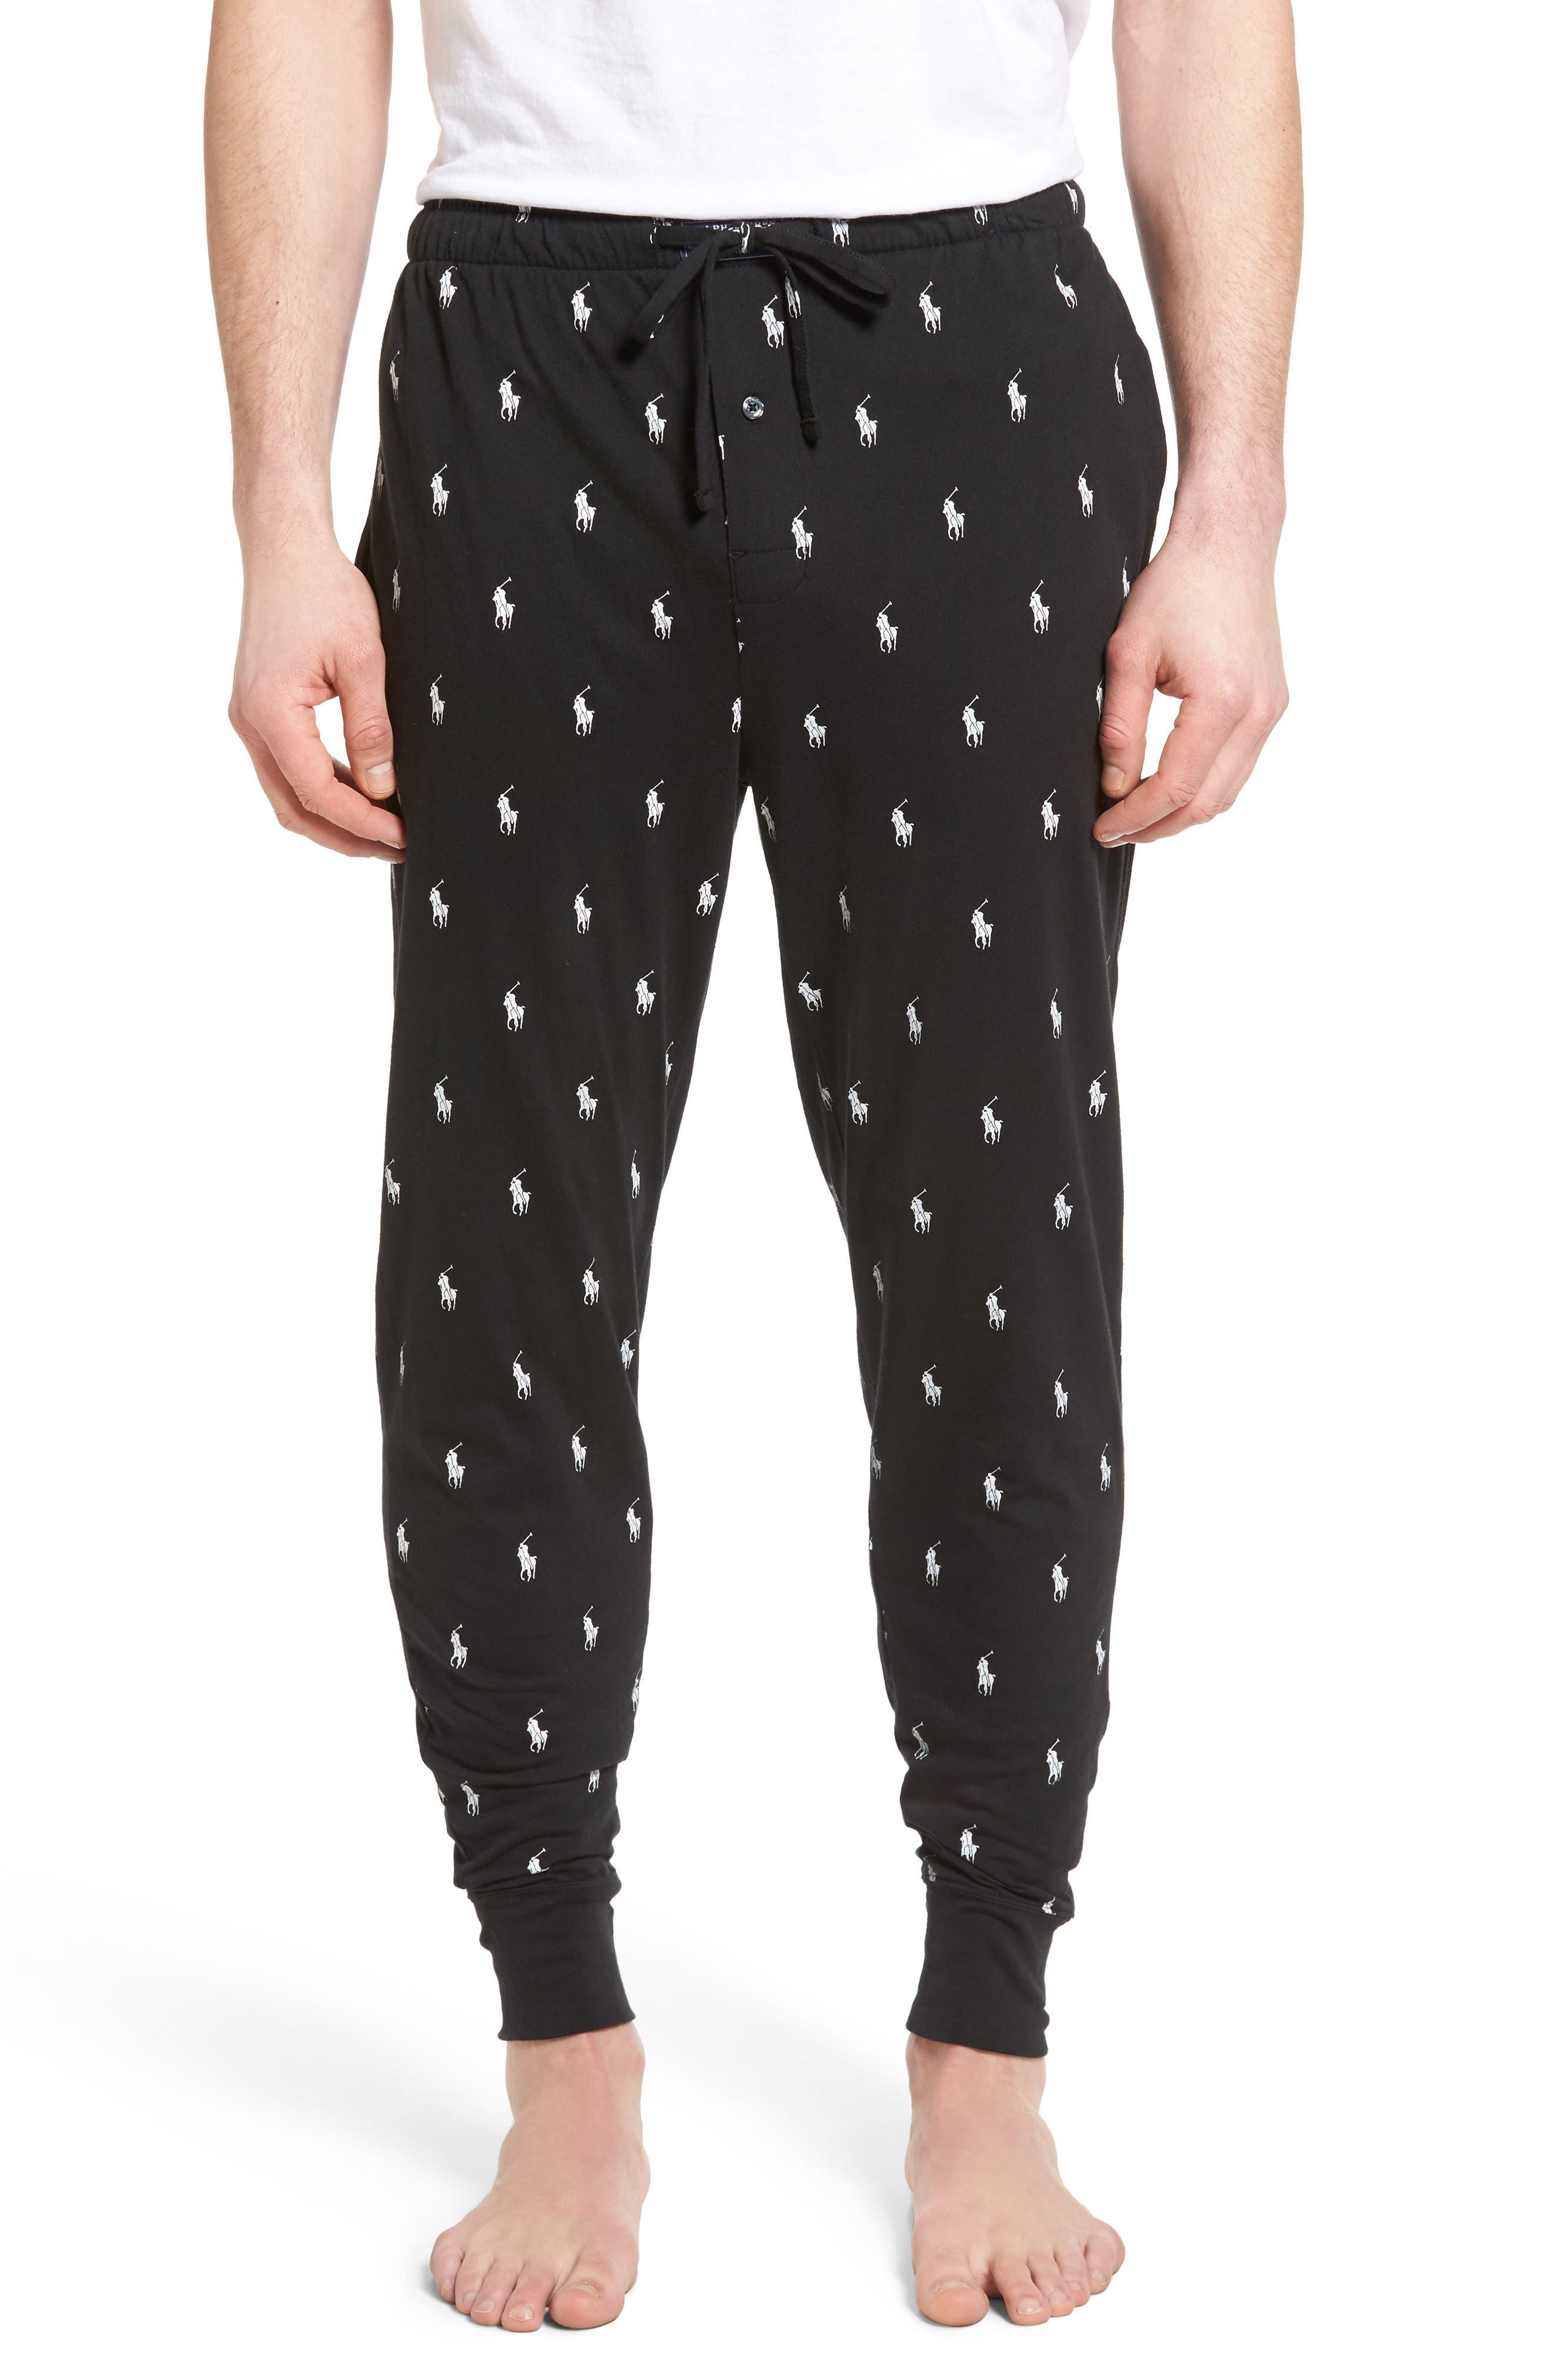 Alternate Image 1 Selected - Polo Ralph Lauren Knit Pony Lounge Pants